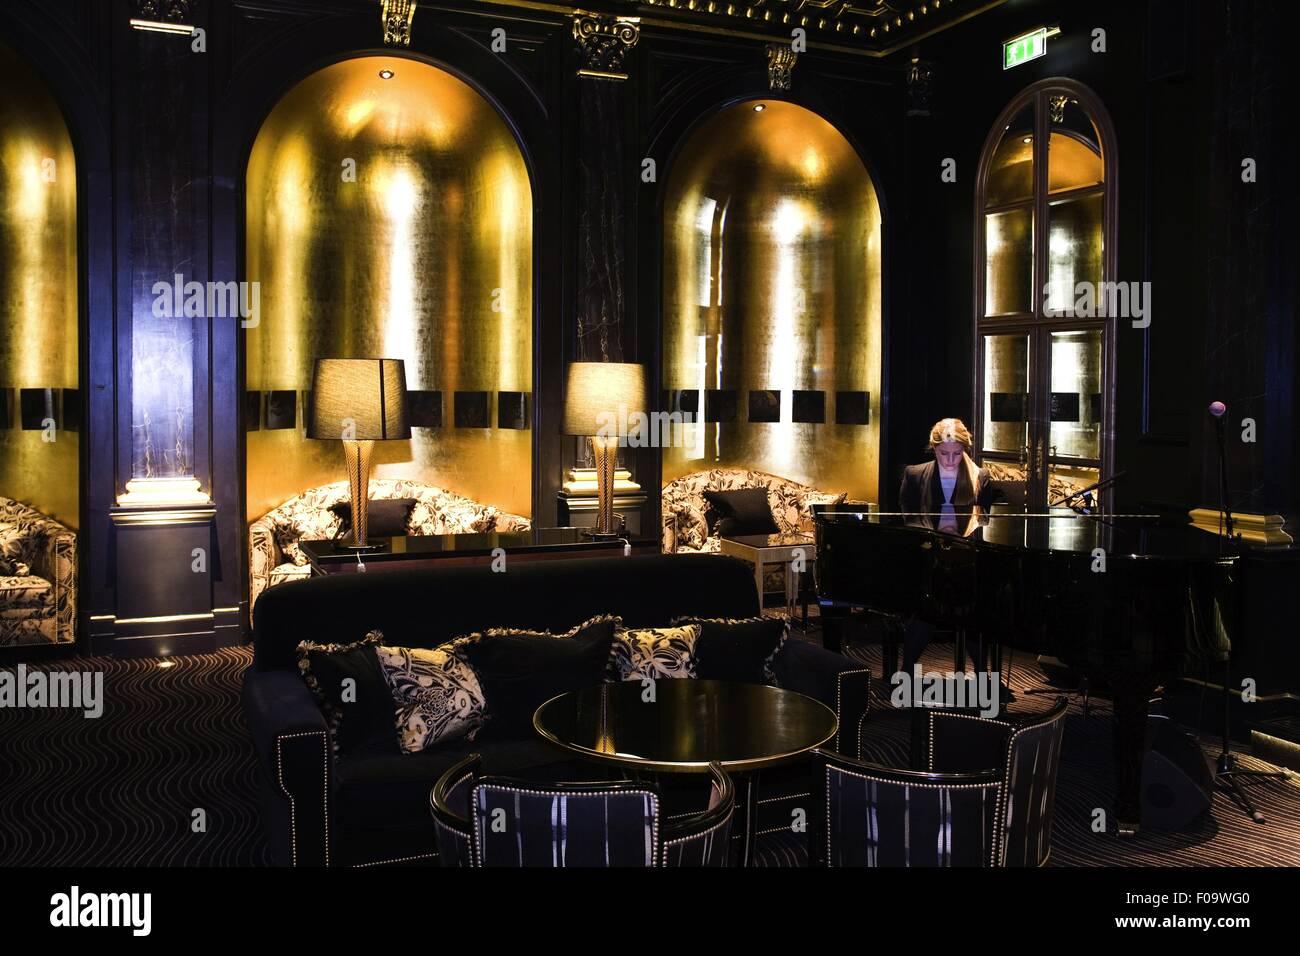 image savoy hotel bar - photo #17